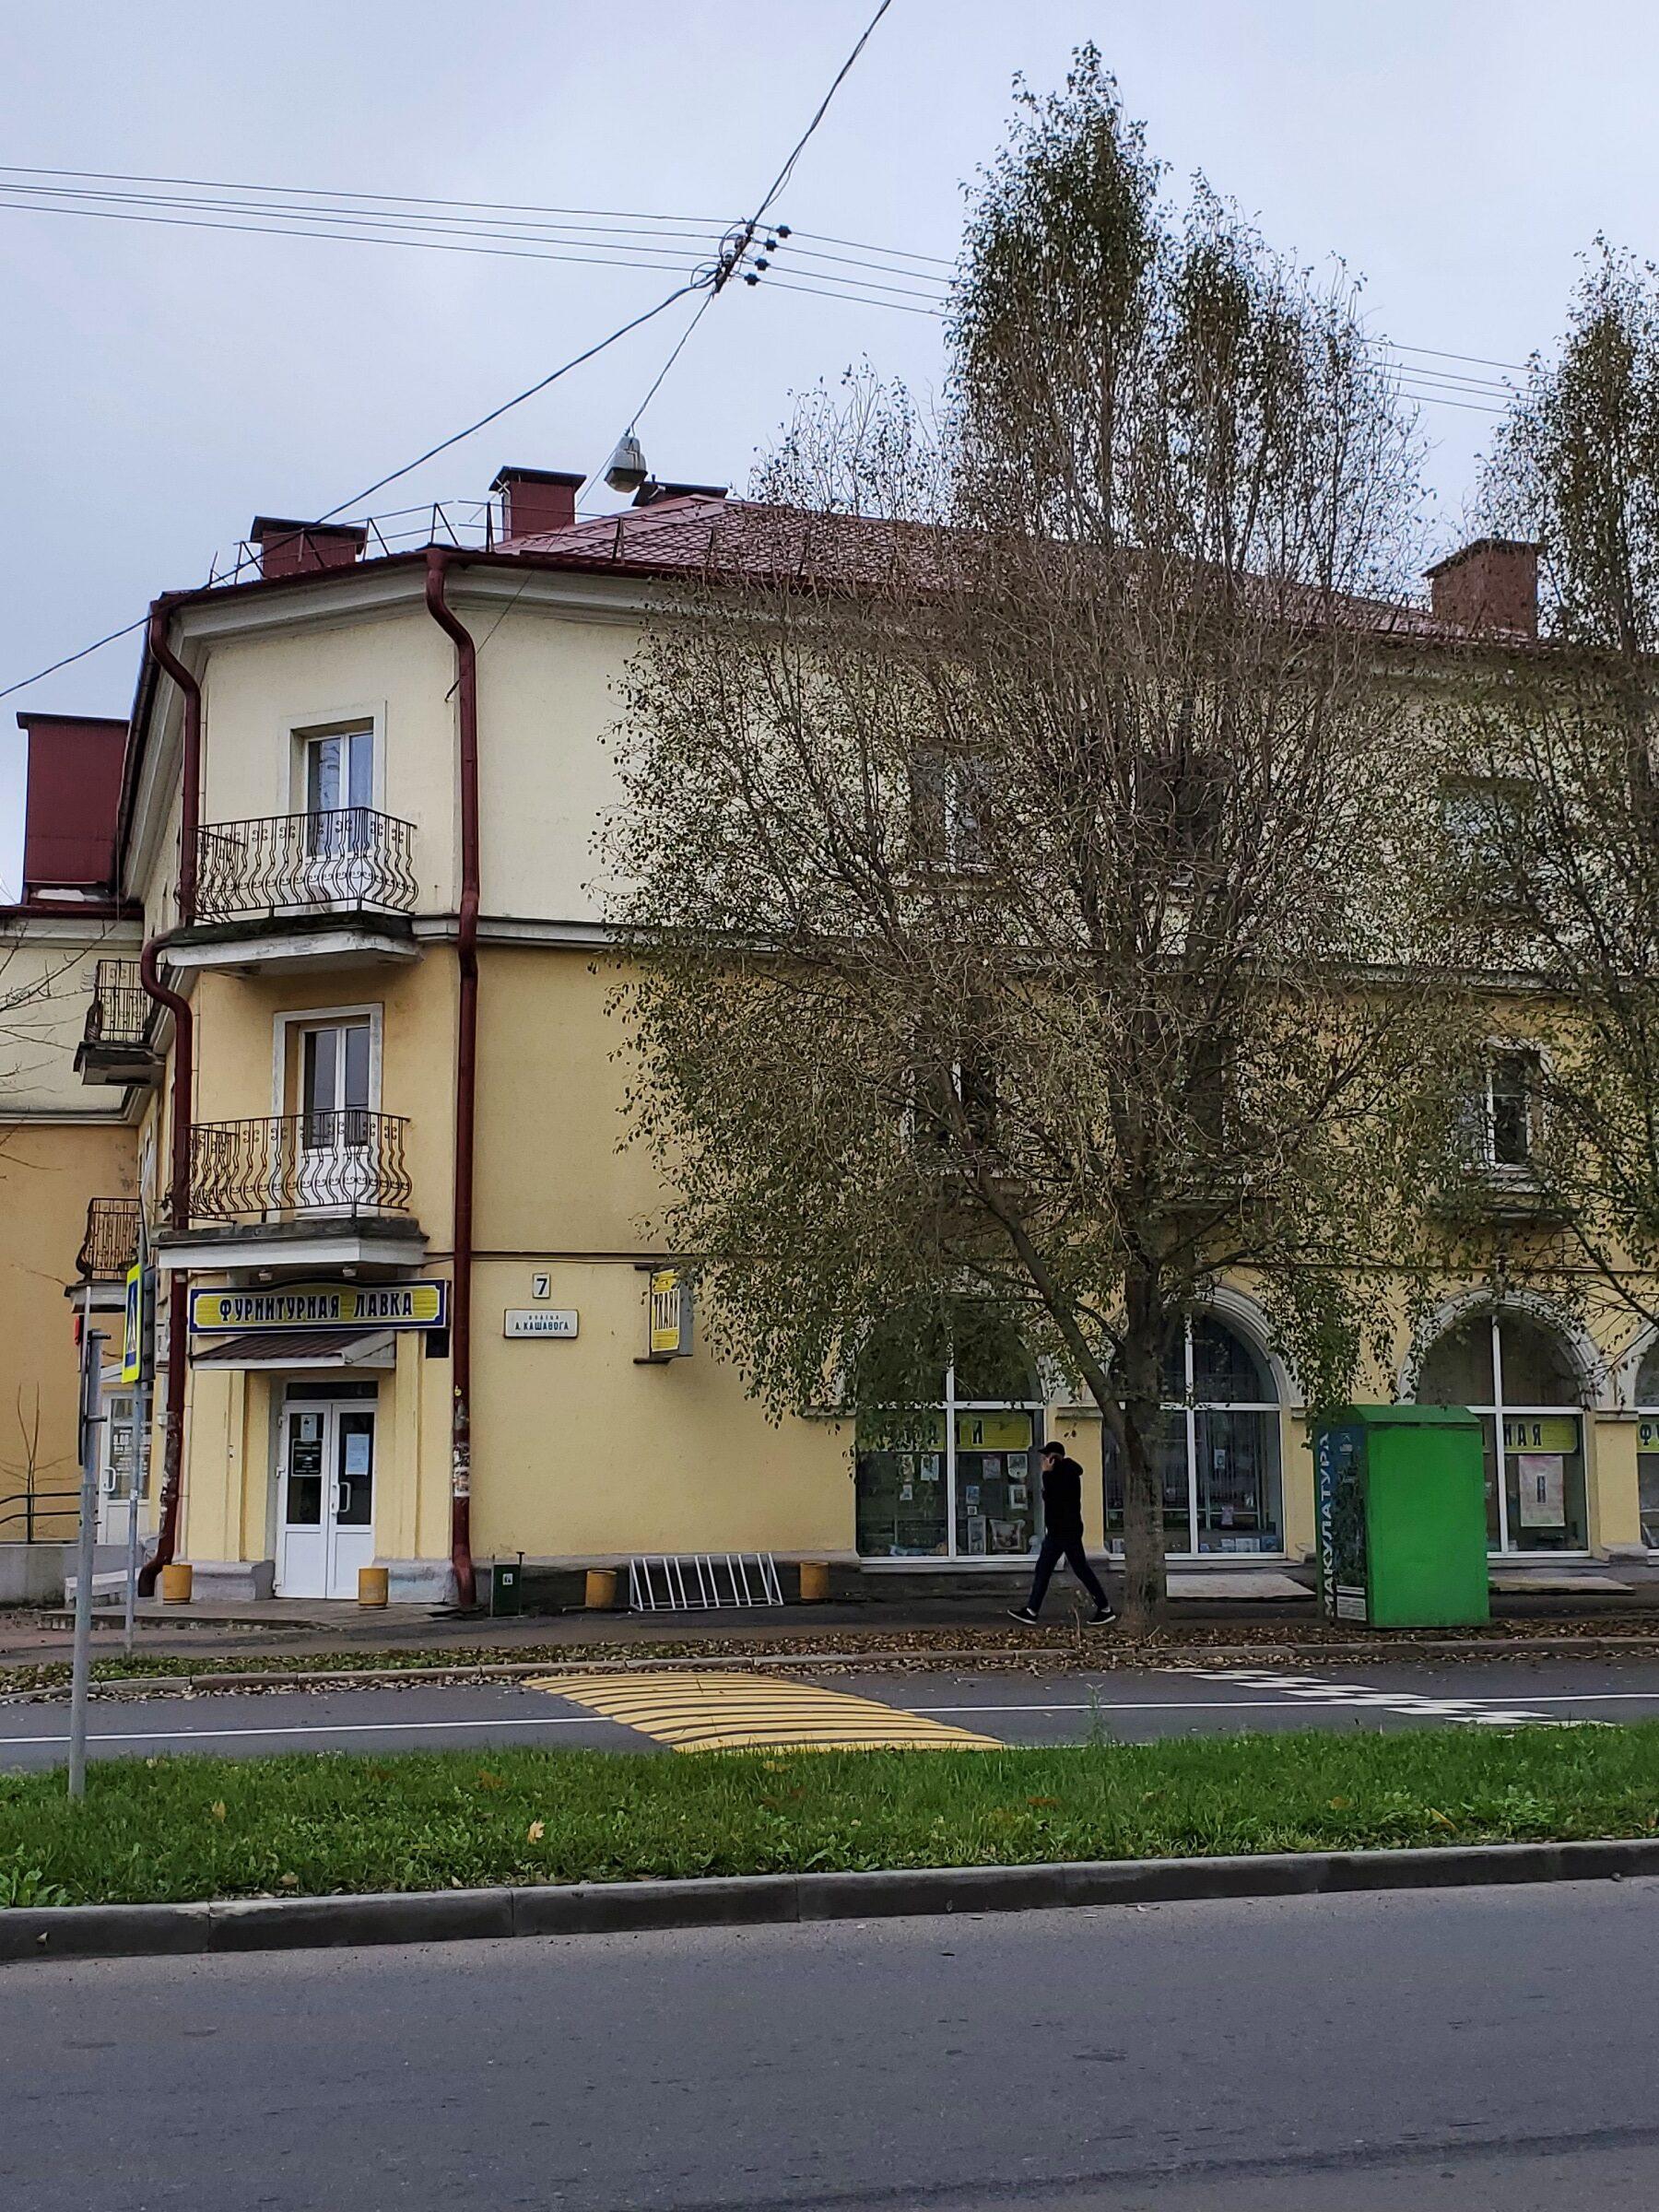 20201107 151649 rotated - Минск. Тракторозаводской поселок